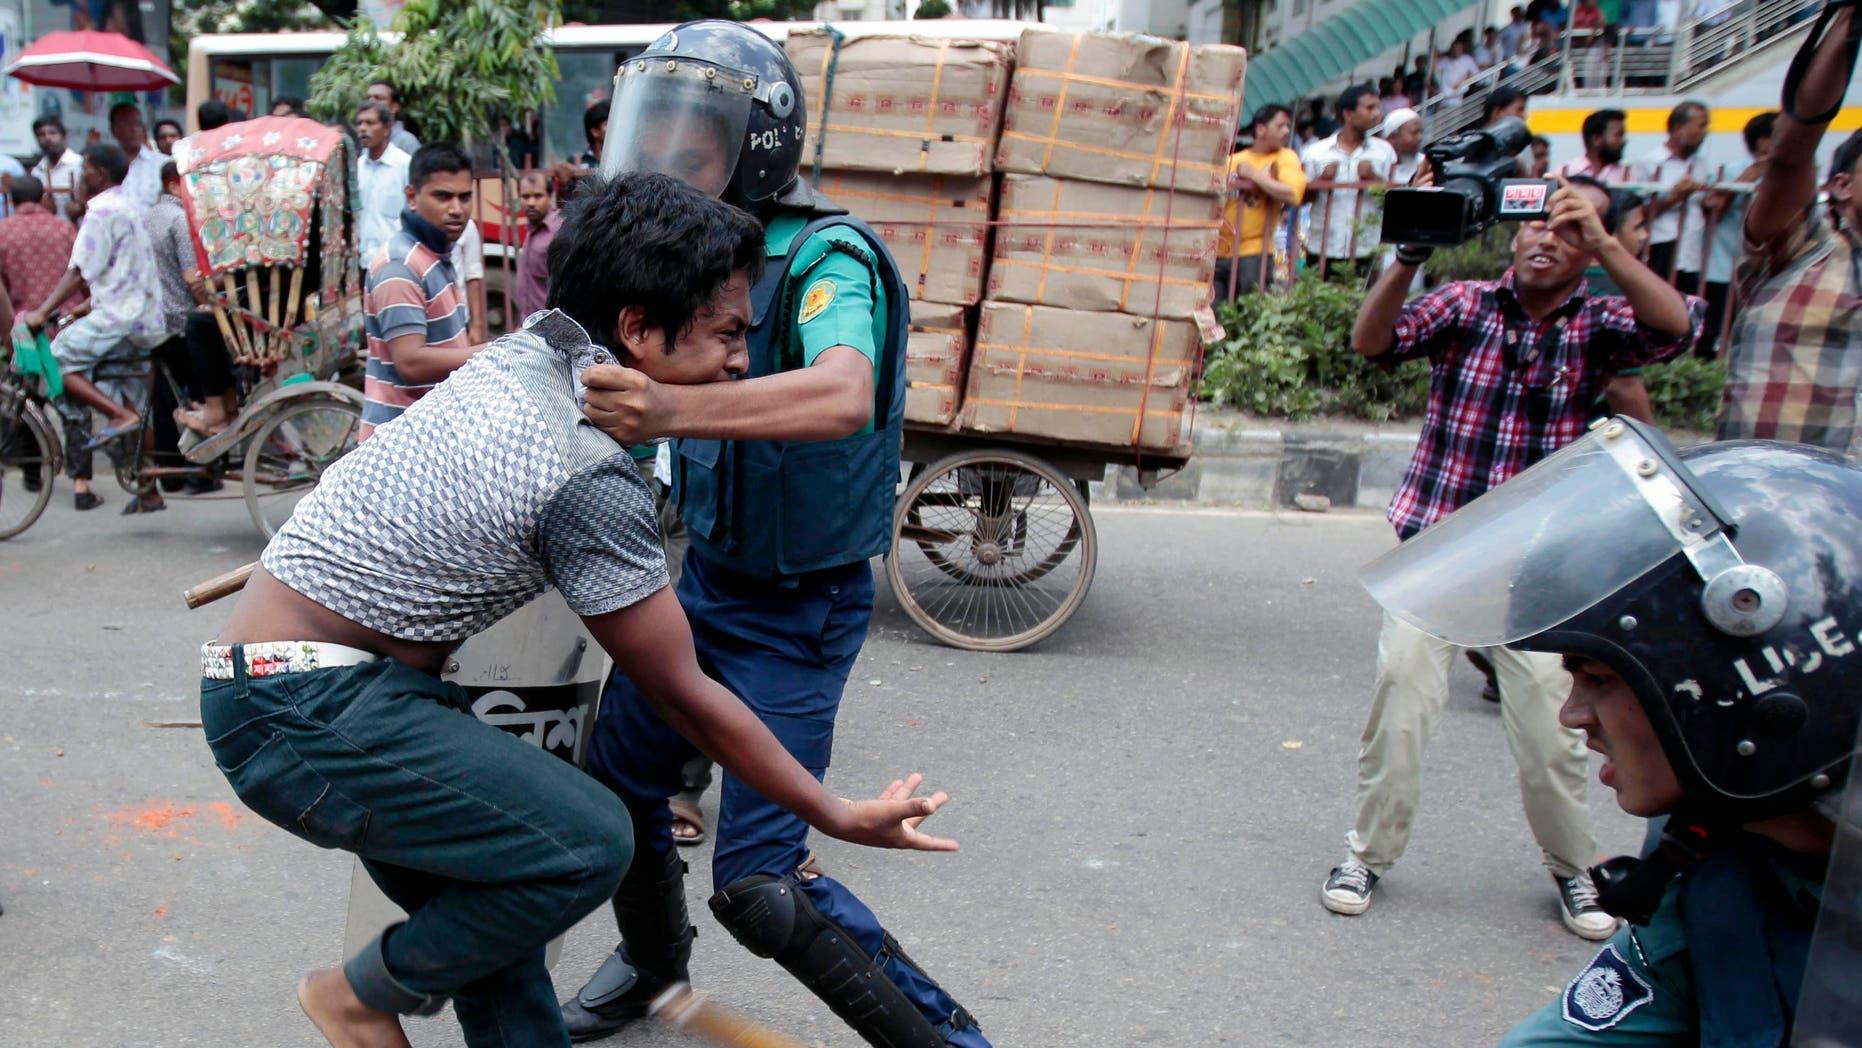 Film protesters, Dhaka police clash